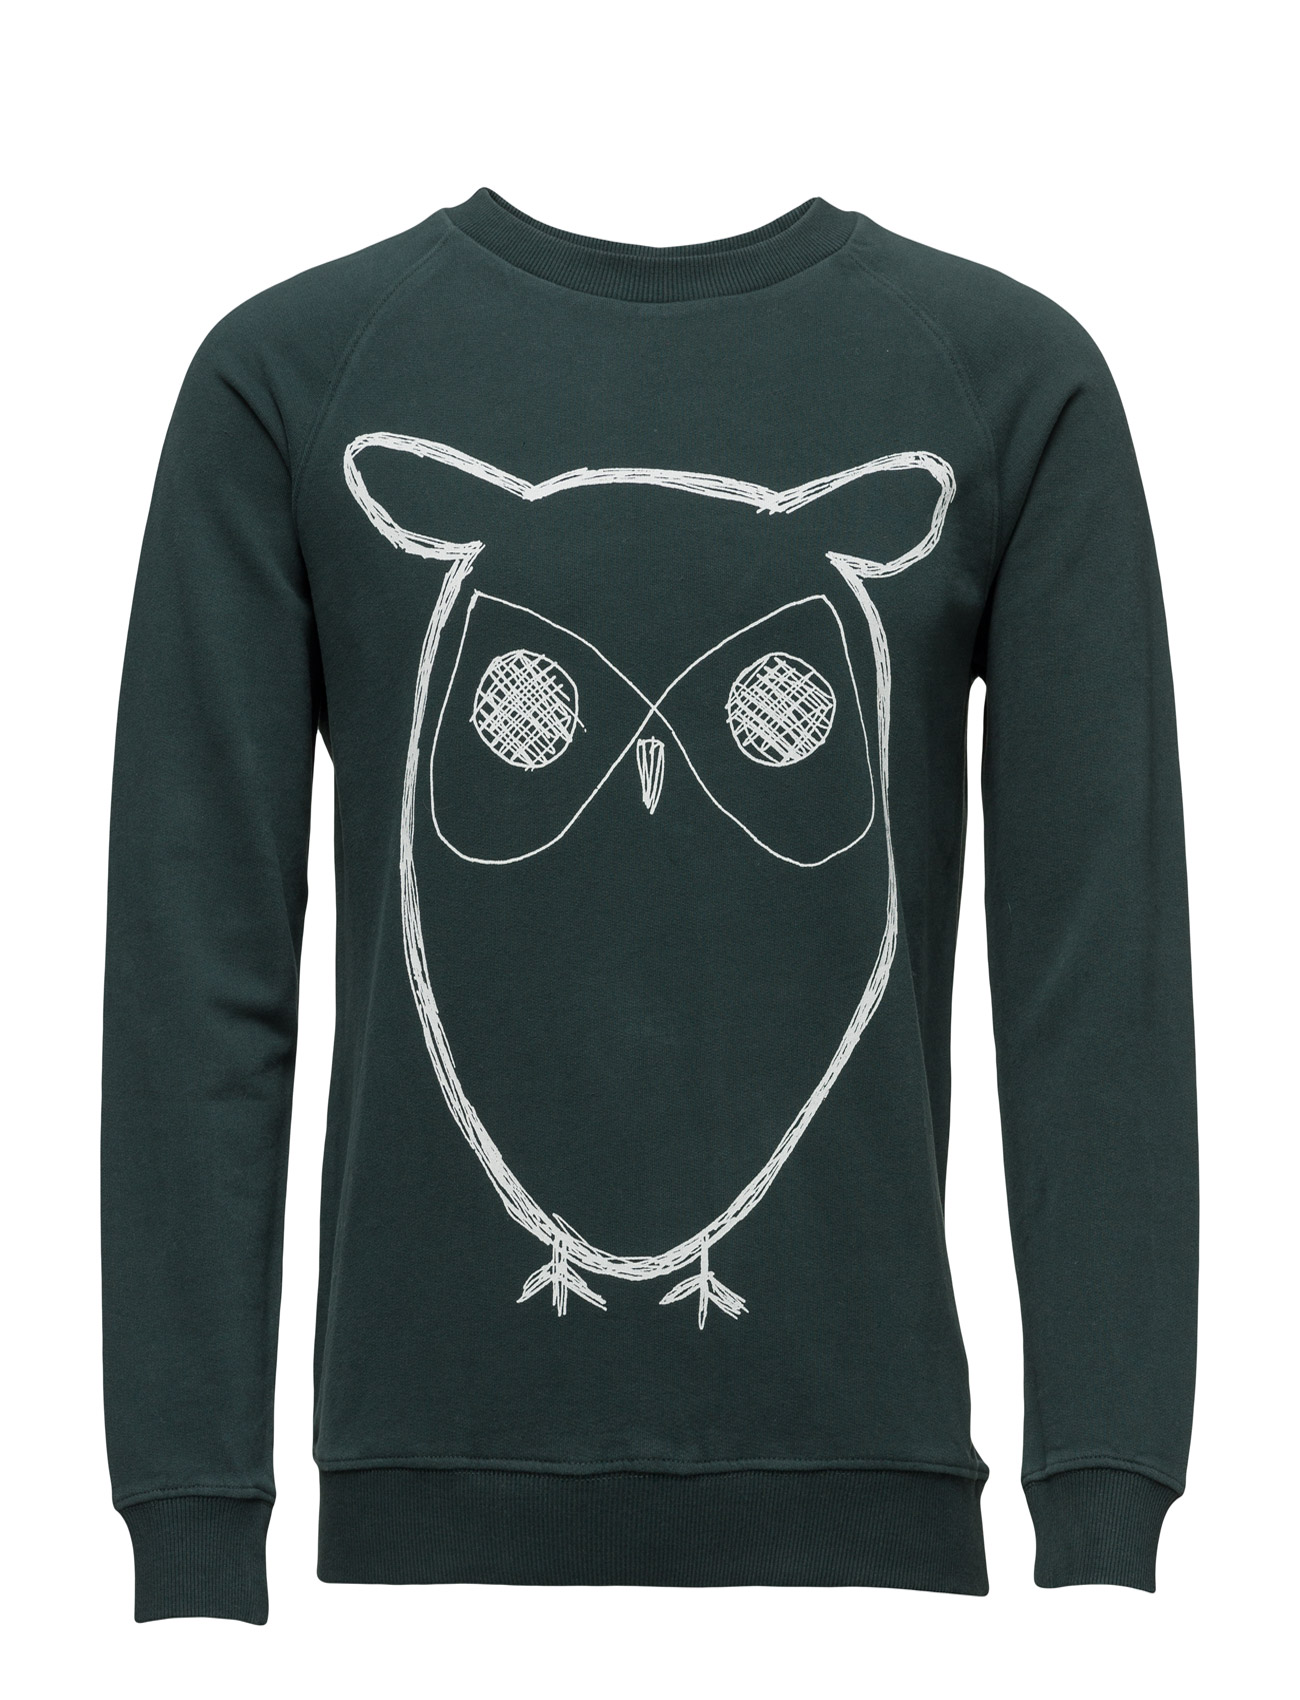 Sweat Shirt With Owl Print - Gots Knowledge Cotton Apparel Sweat pants til Herrer i Grønnebakken